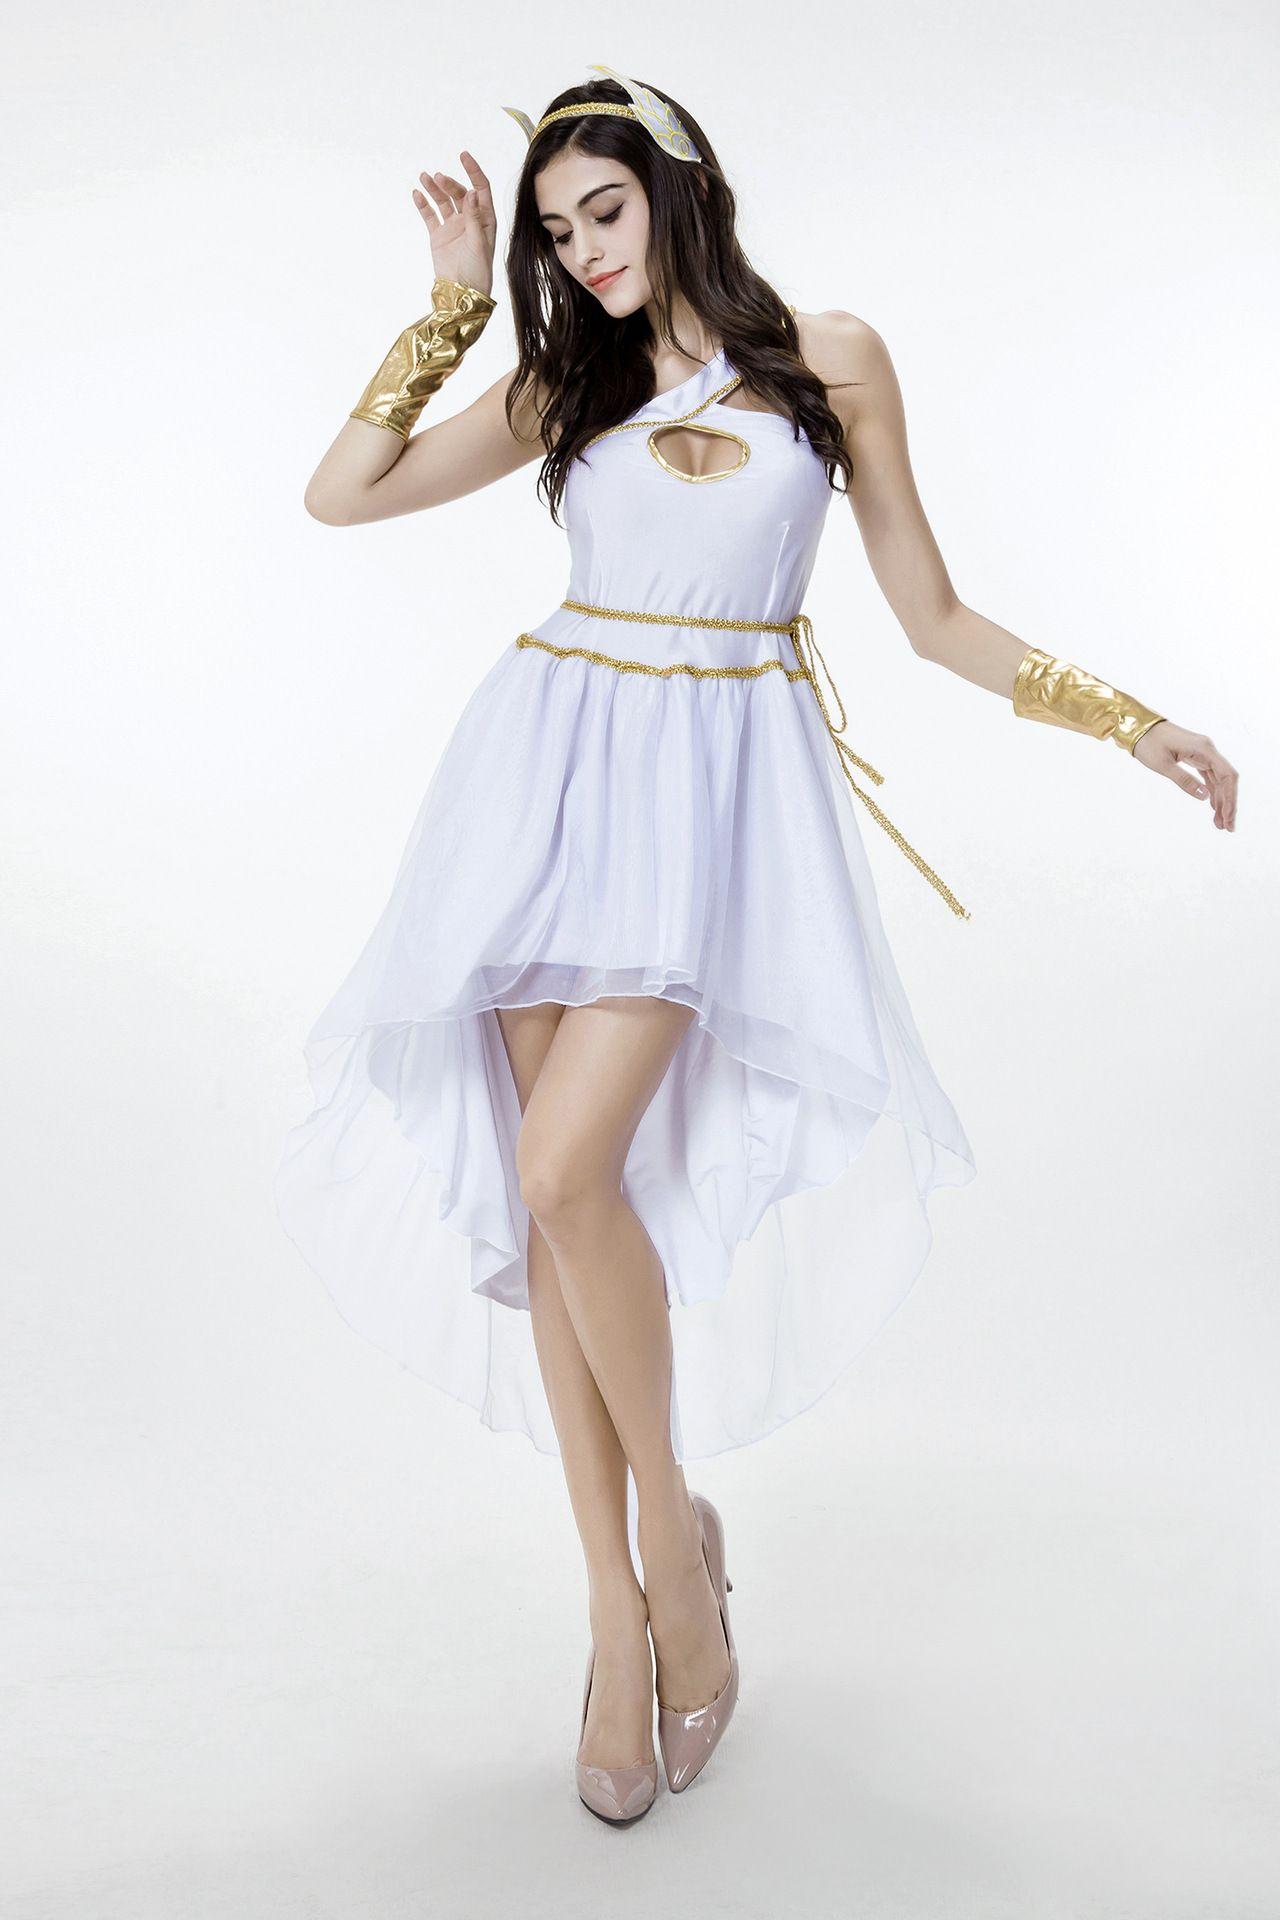 2017 New Arrival Adult Women Greek Goddess Dress White Sexy ...